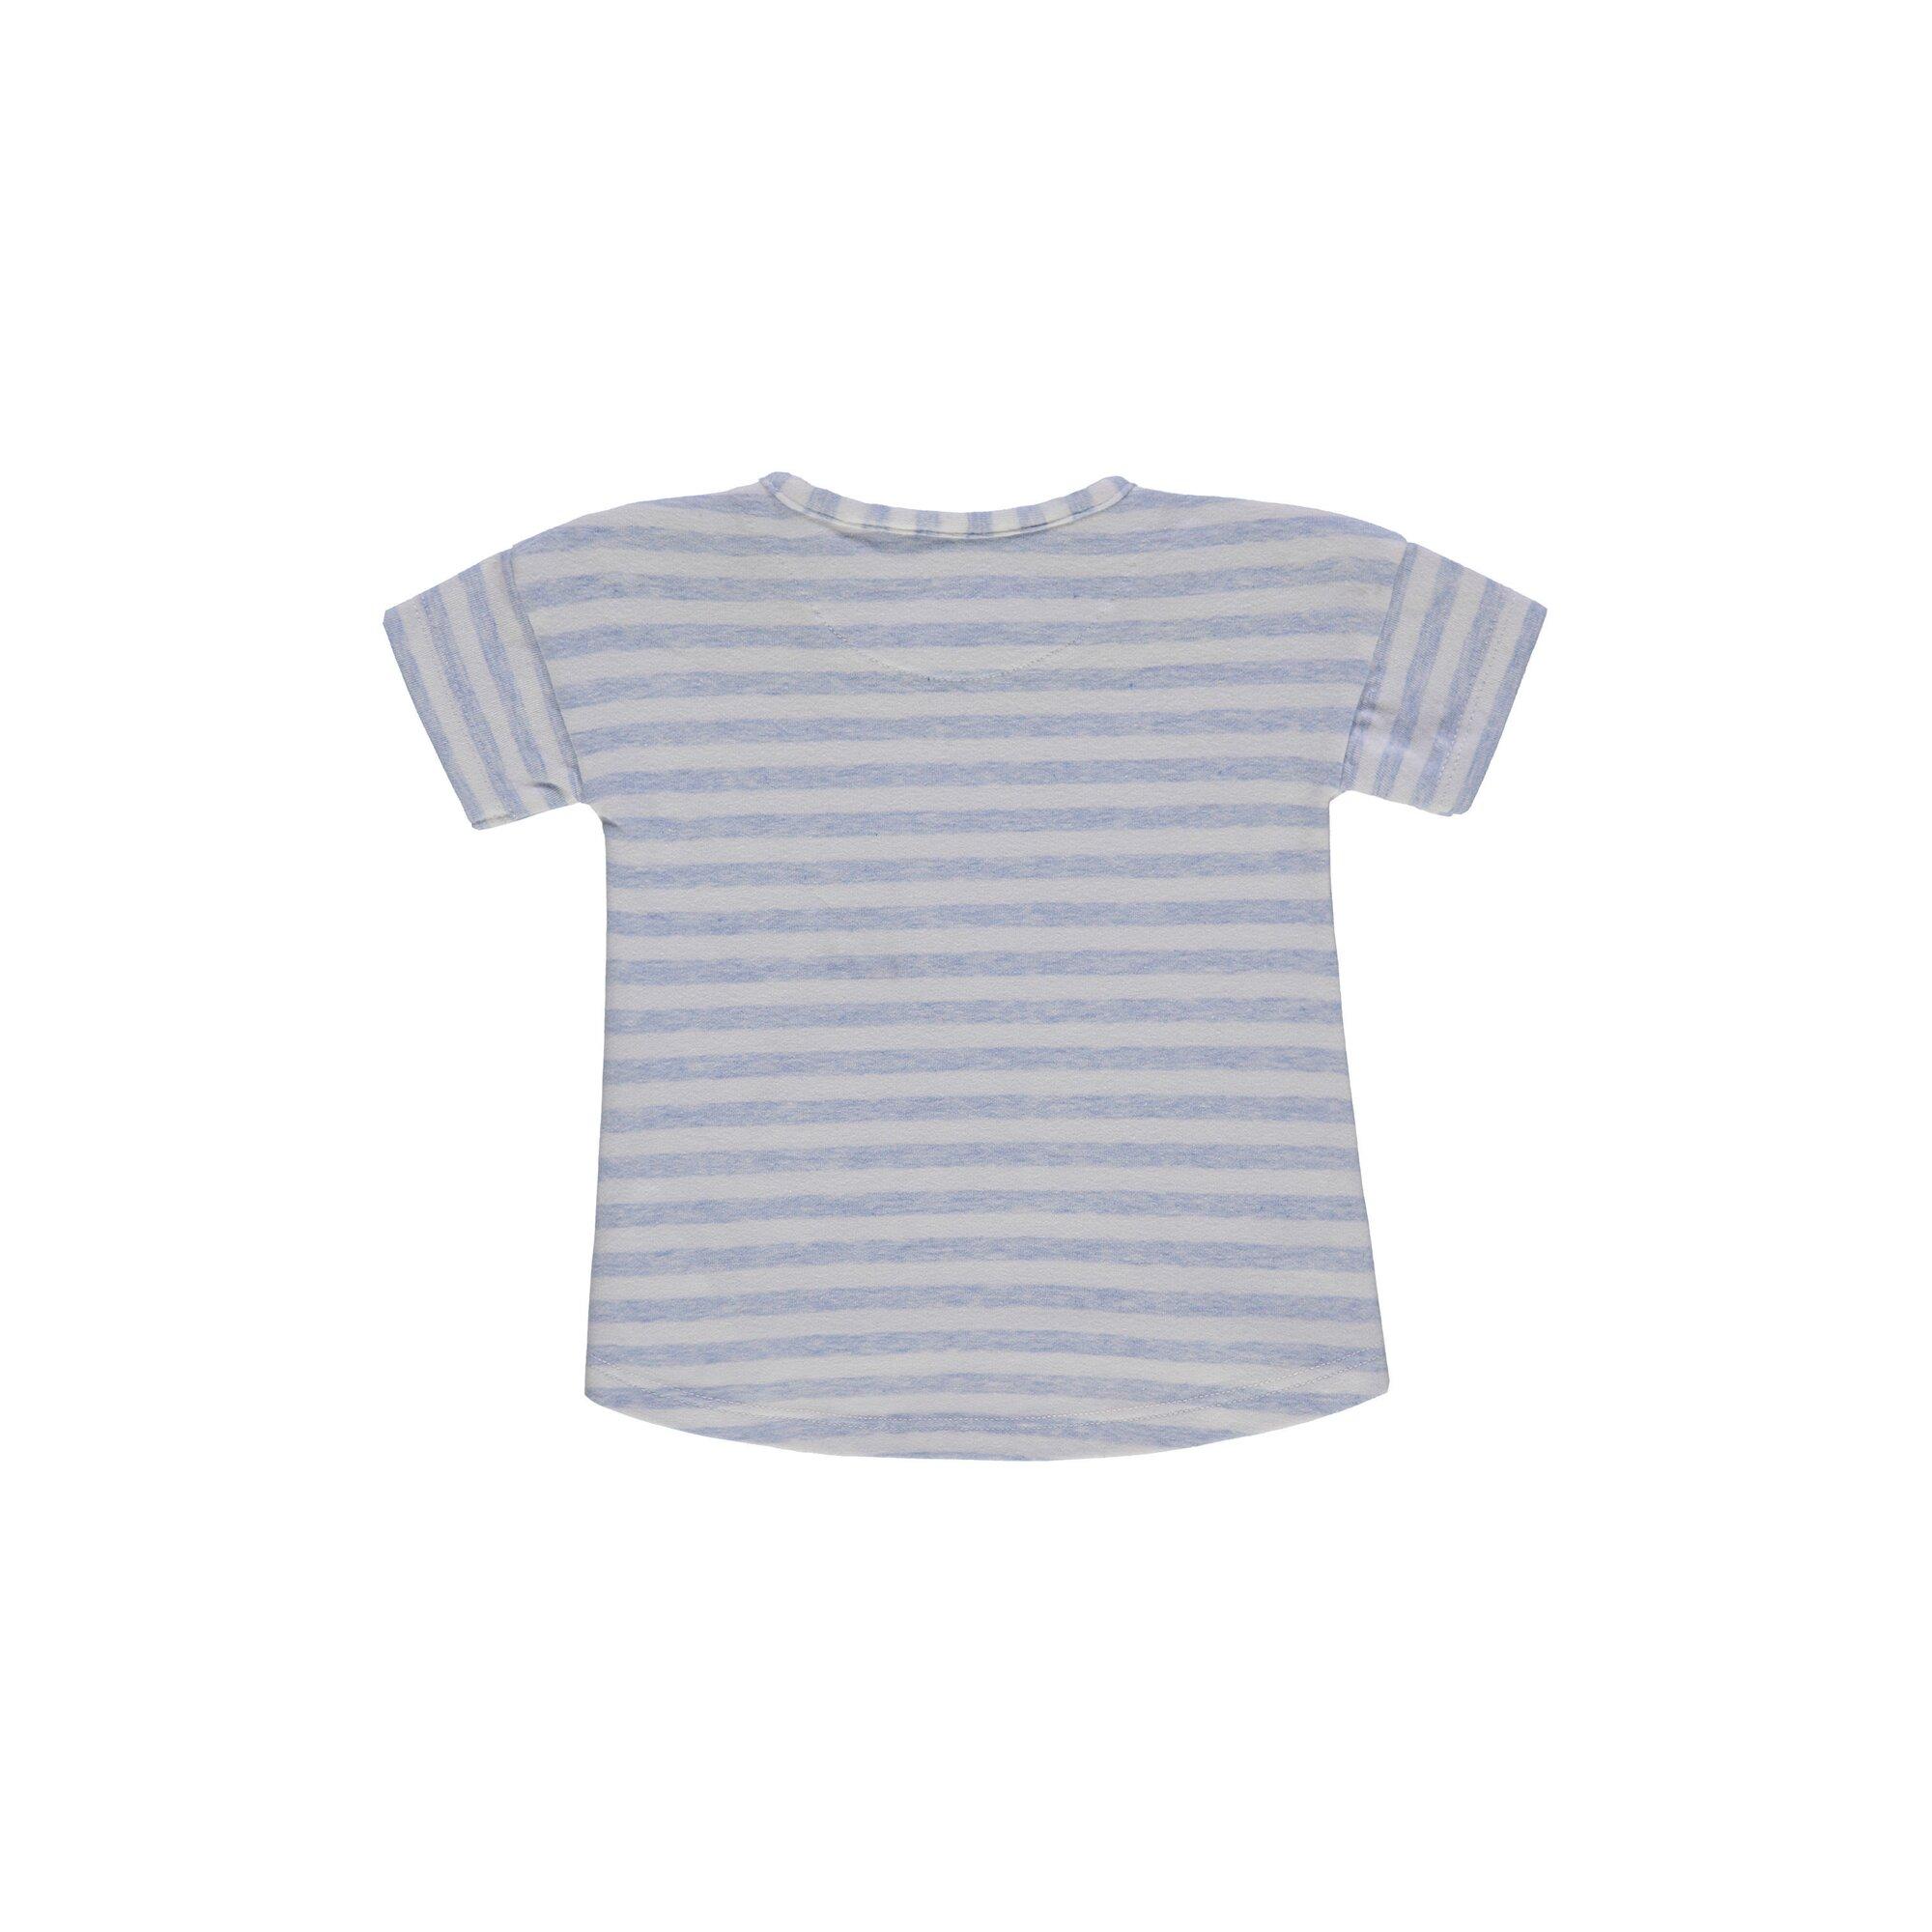 bellybutton-t-shirt, 15.95 EUR @ babywalz-de